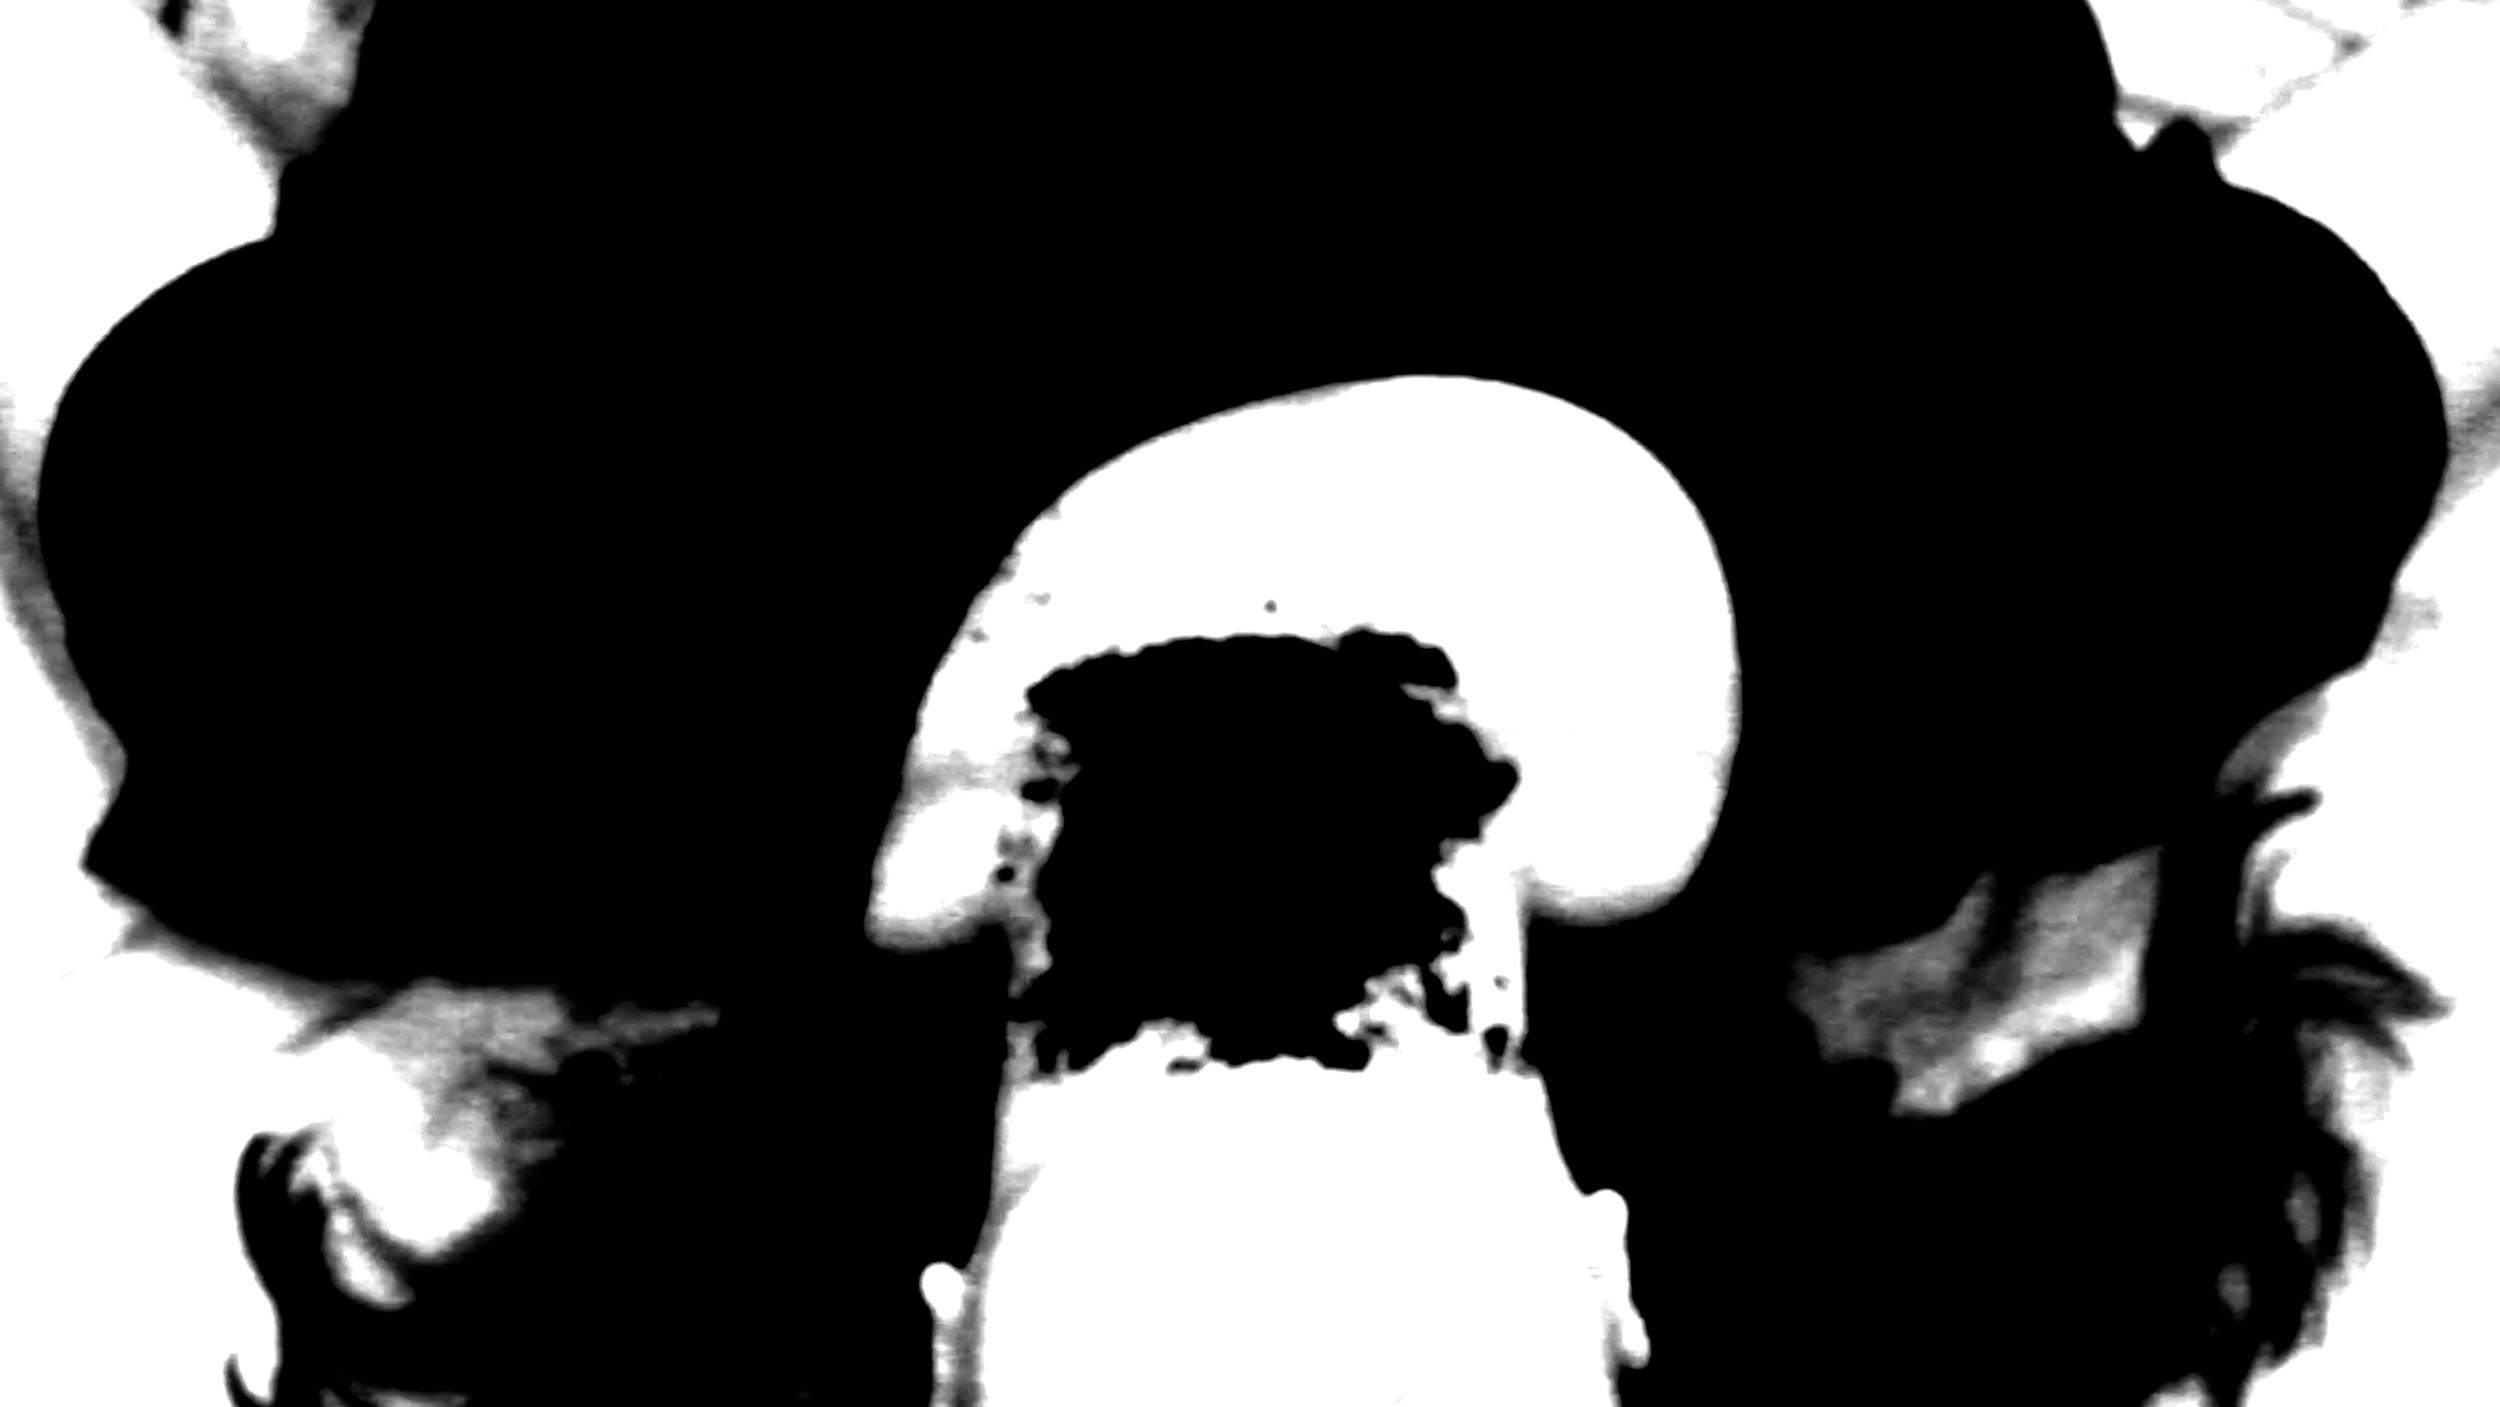 Untitled (throat), 2013